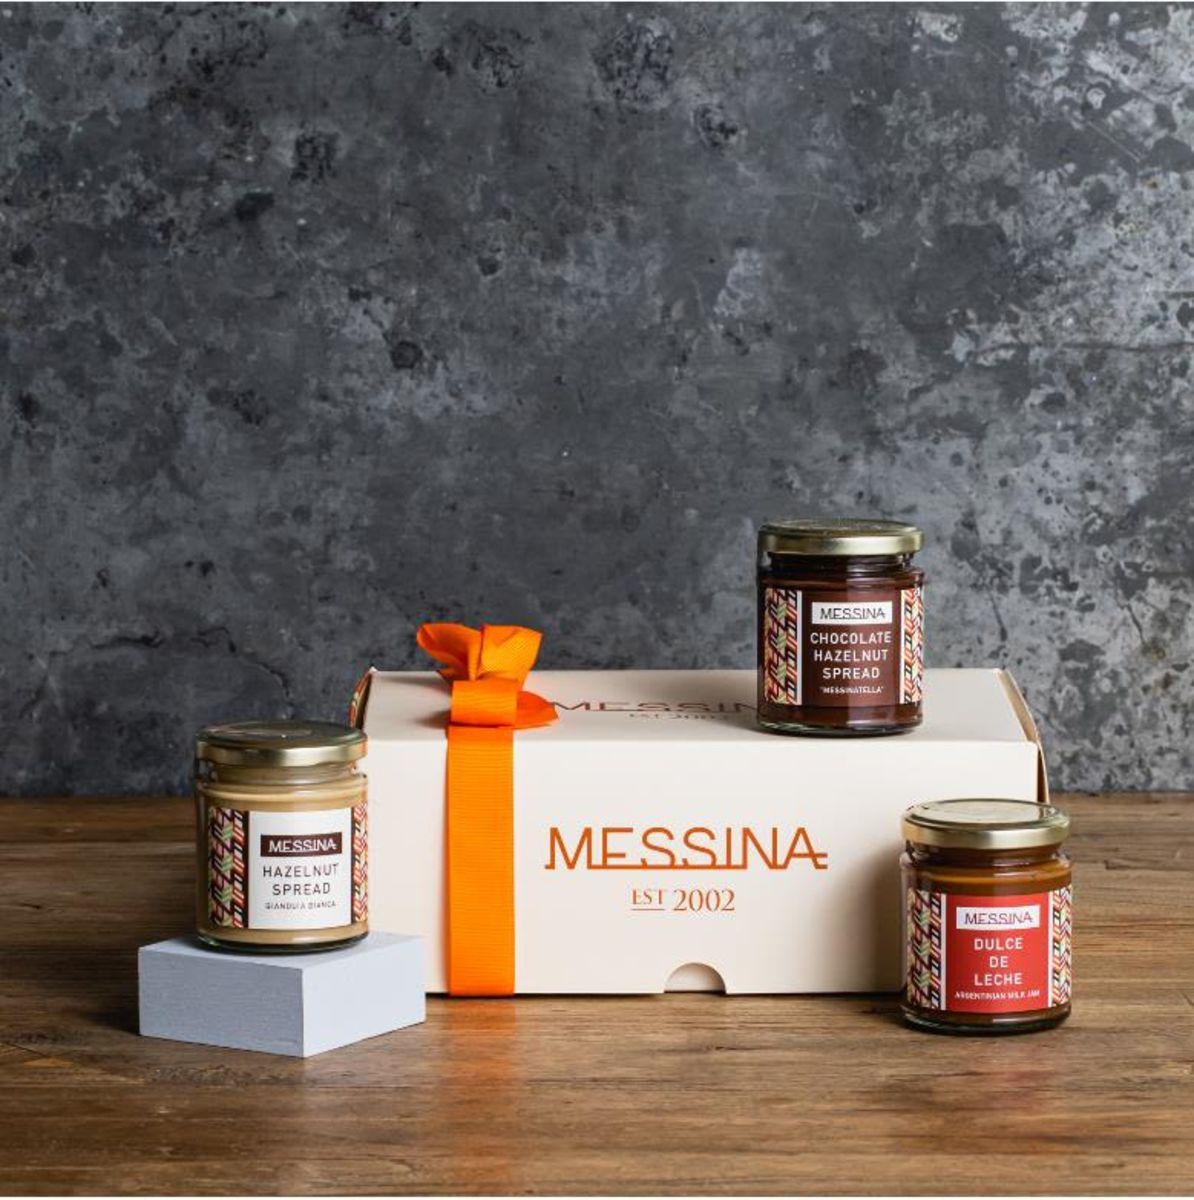 Messina Gift Pack